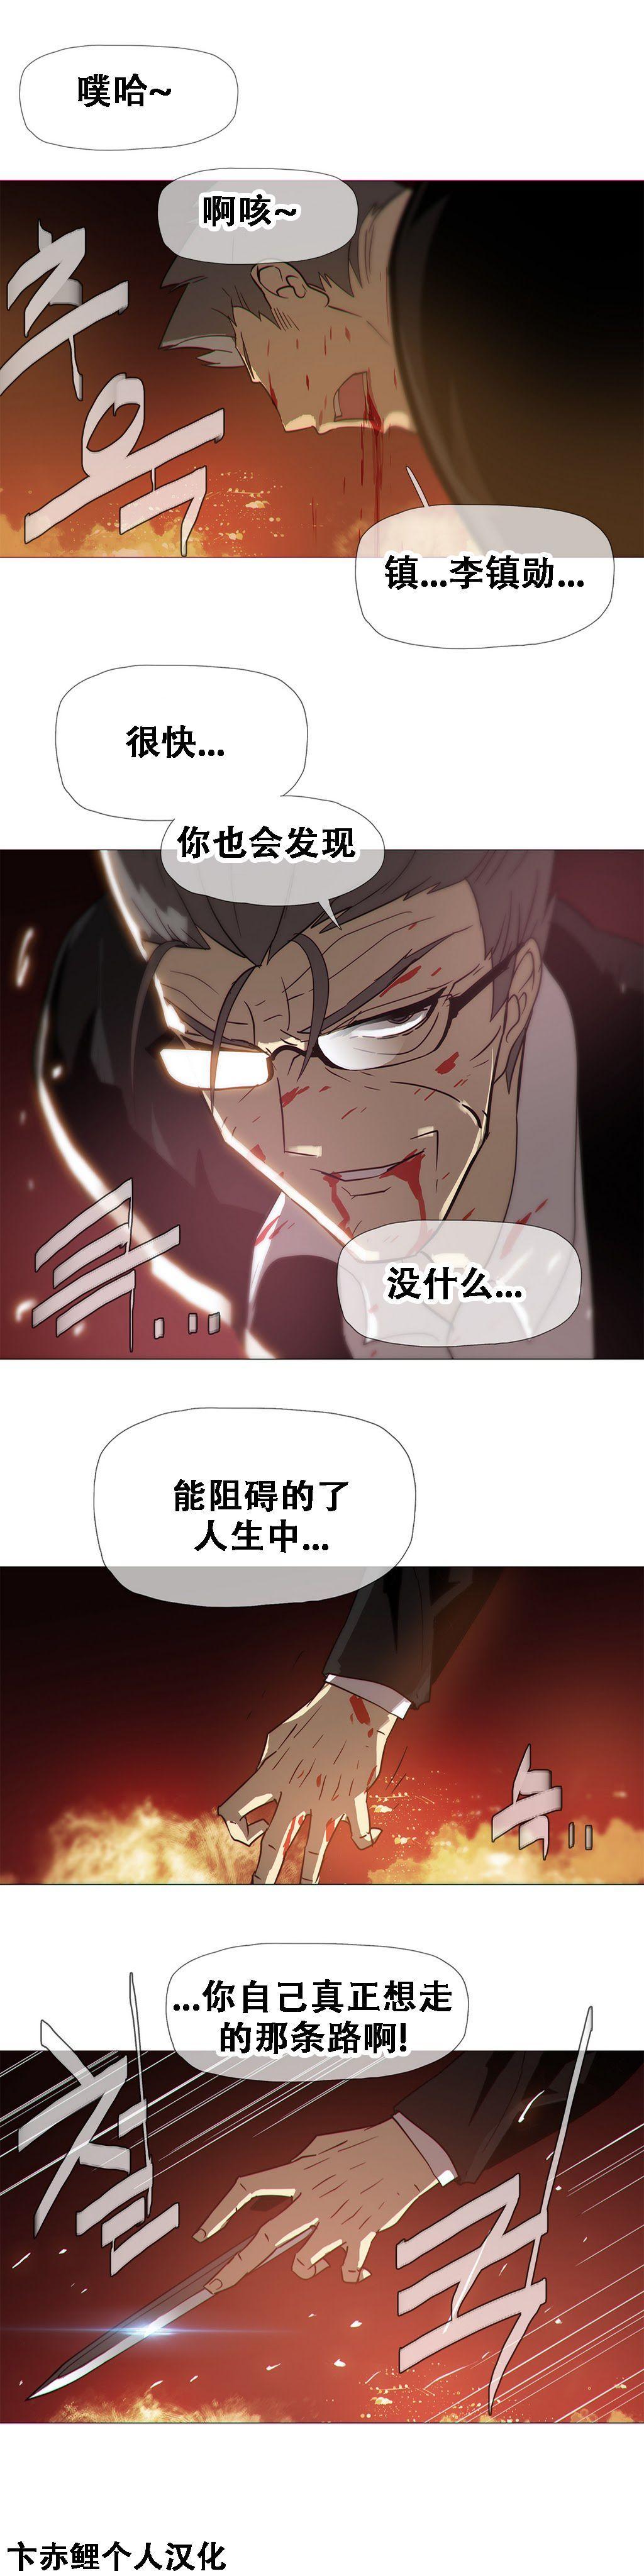 HouseHold Affairs 【卞赤鲤个人汉化】1~33话(持续更新中) 394